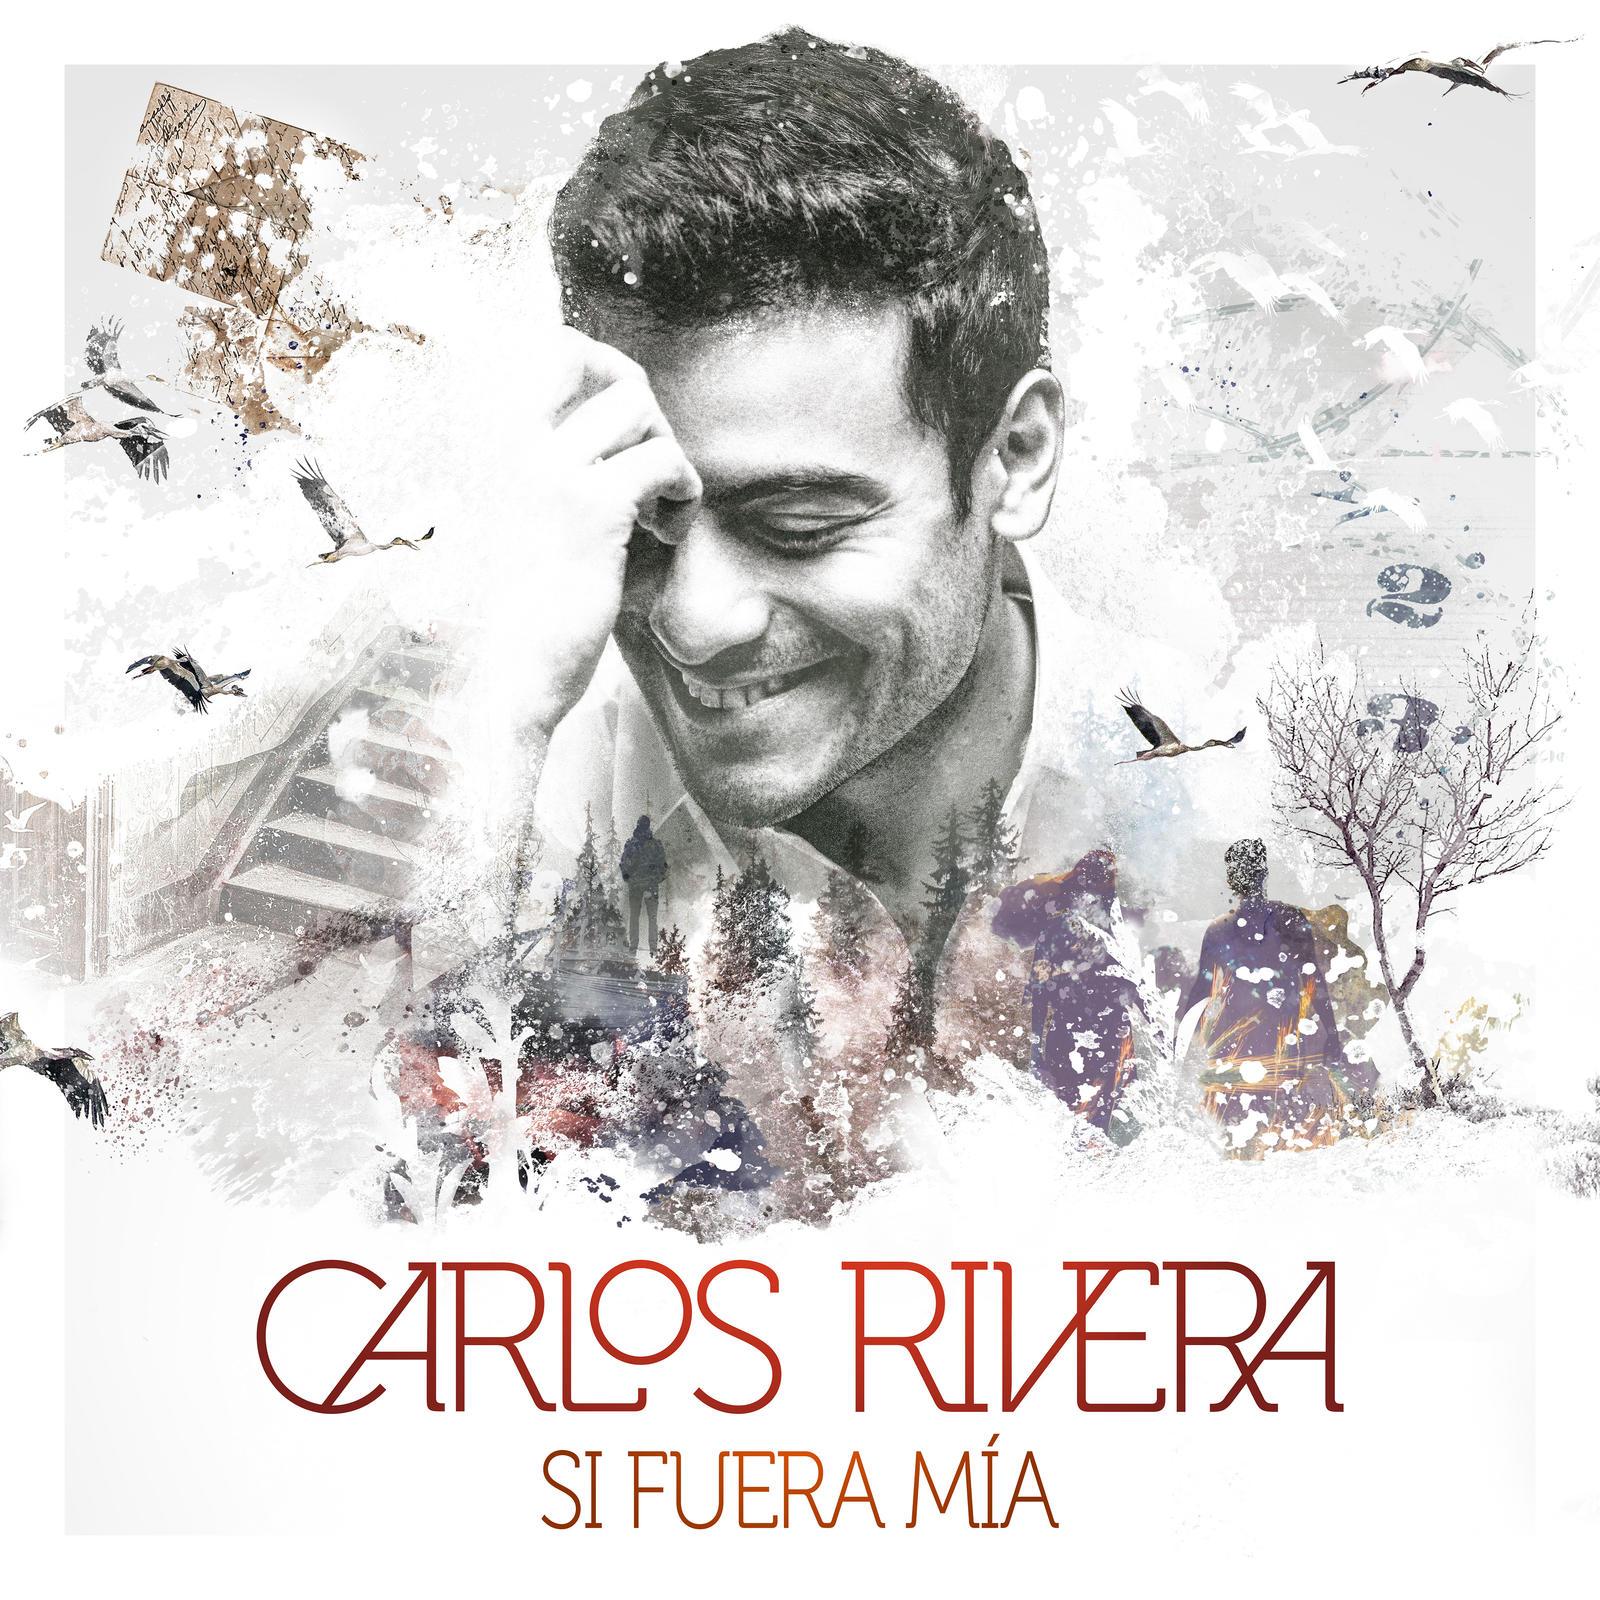 Carlos Rivera Si fuera mia